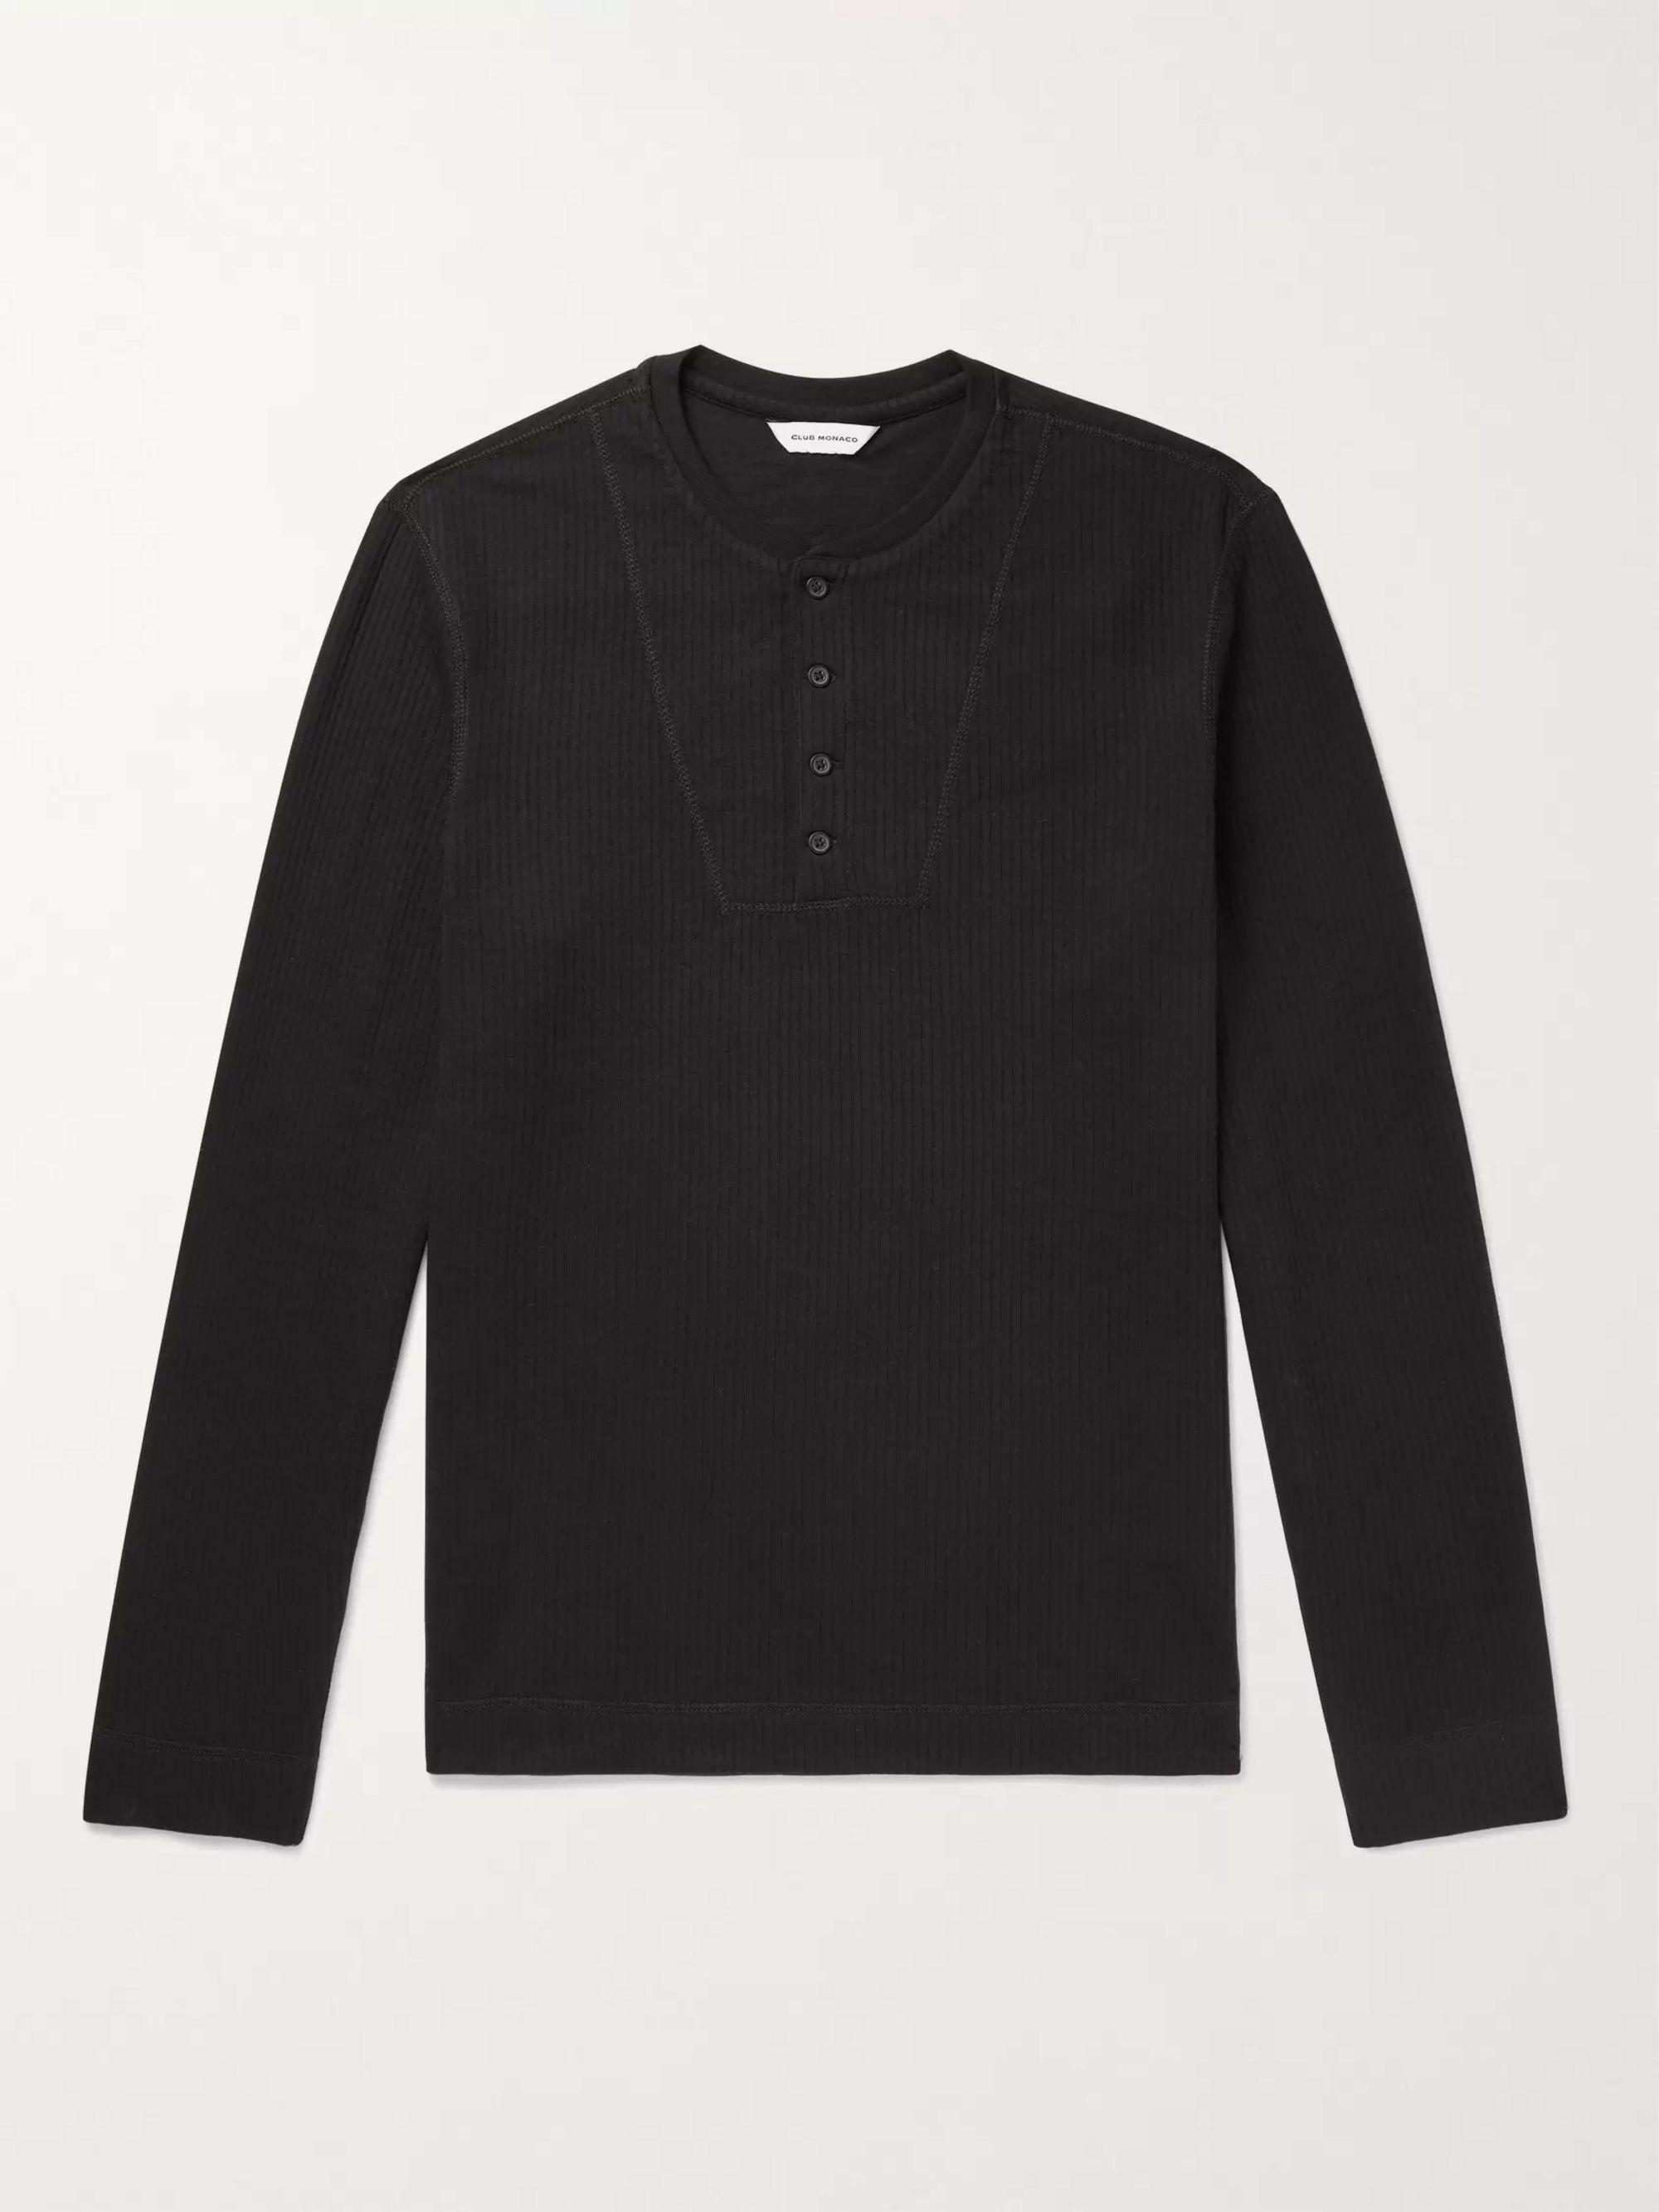 CLUB MONACO Slim-Fit Ribbed Cotton-Blend Henley T-Shirt